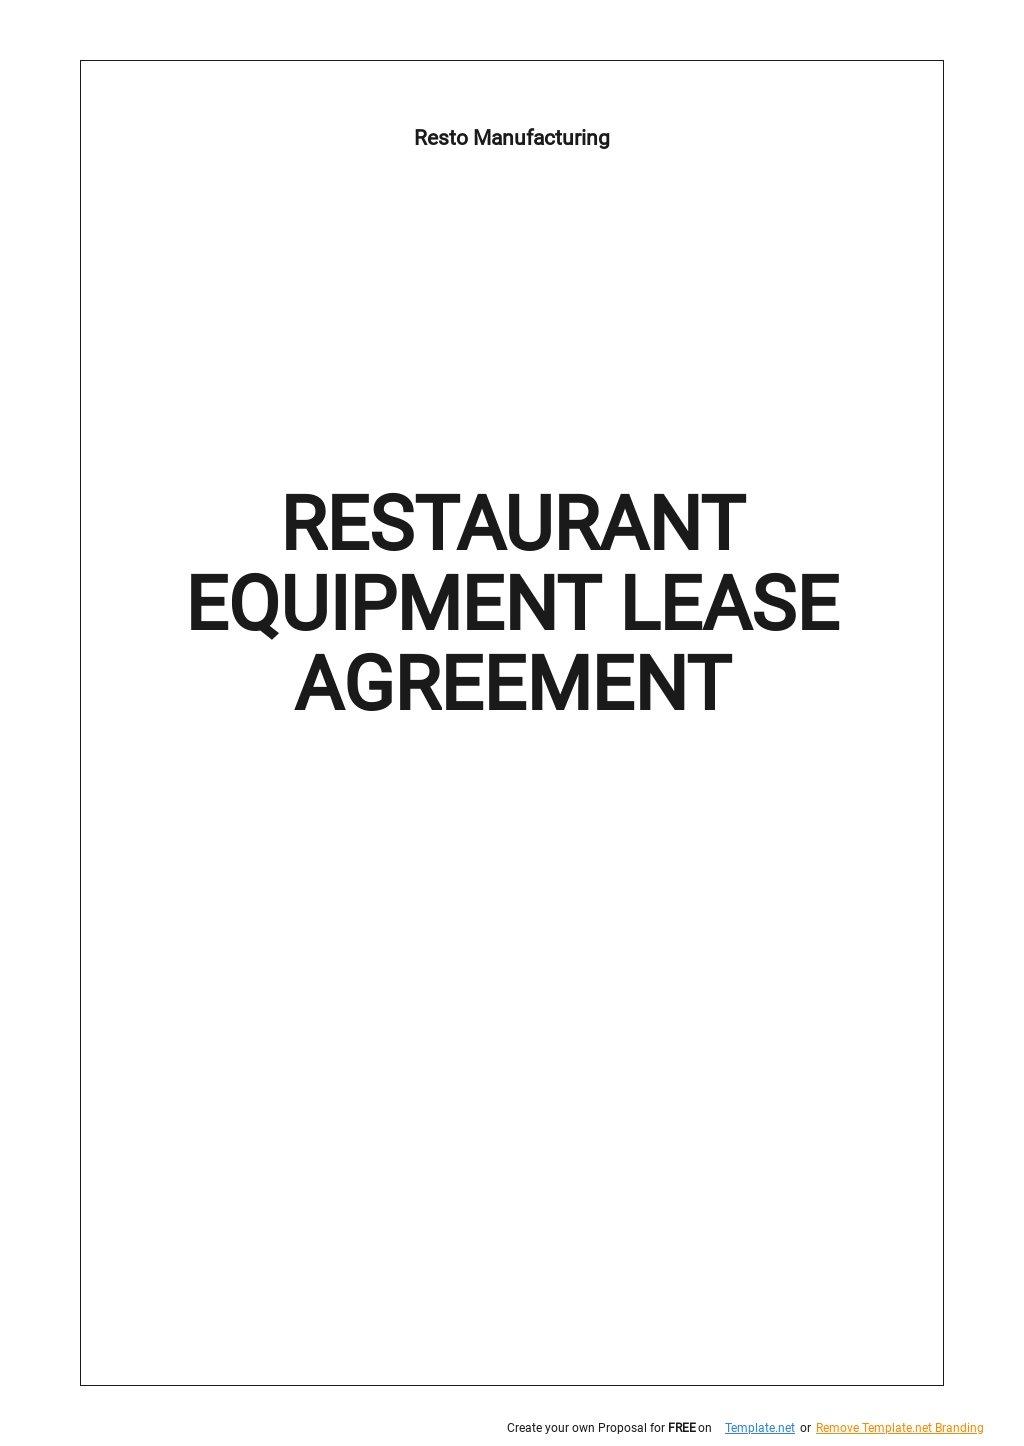 Restaurant Equipment Lease Agreement Template.jpe